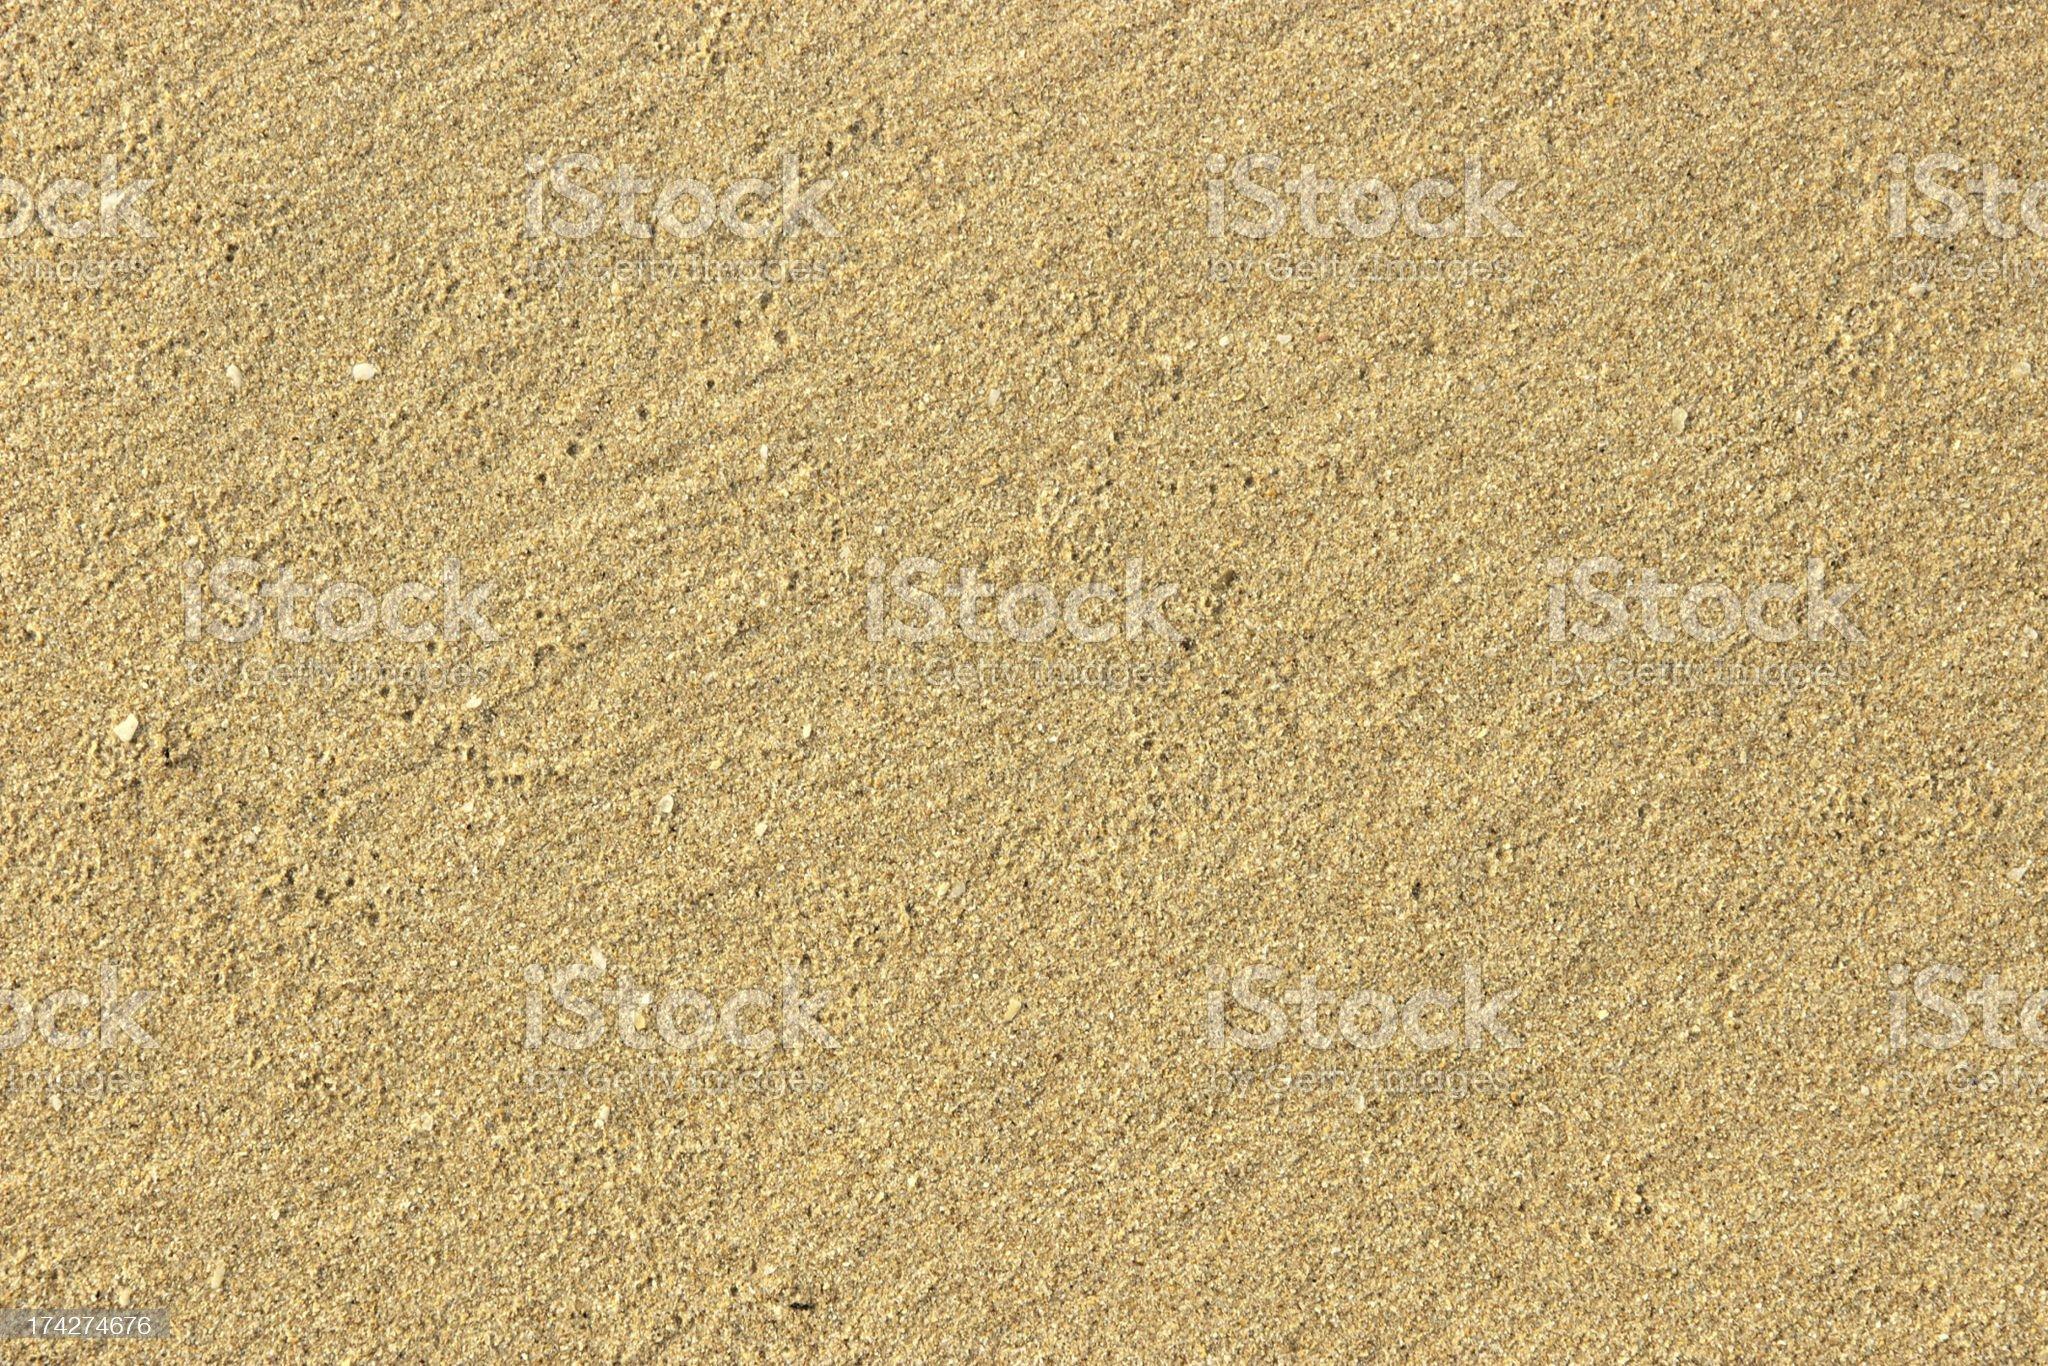 Yellow sand. Texture. royalty-free stock photo